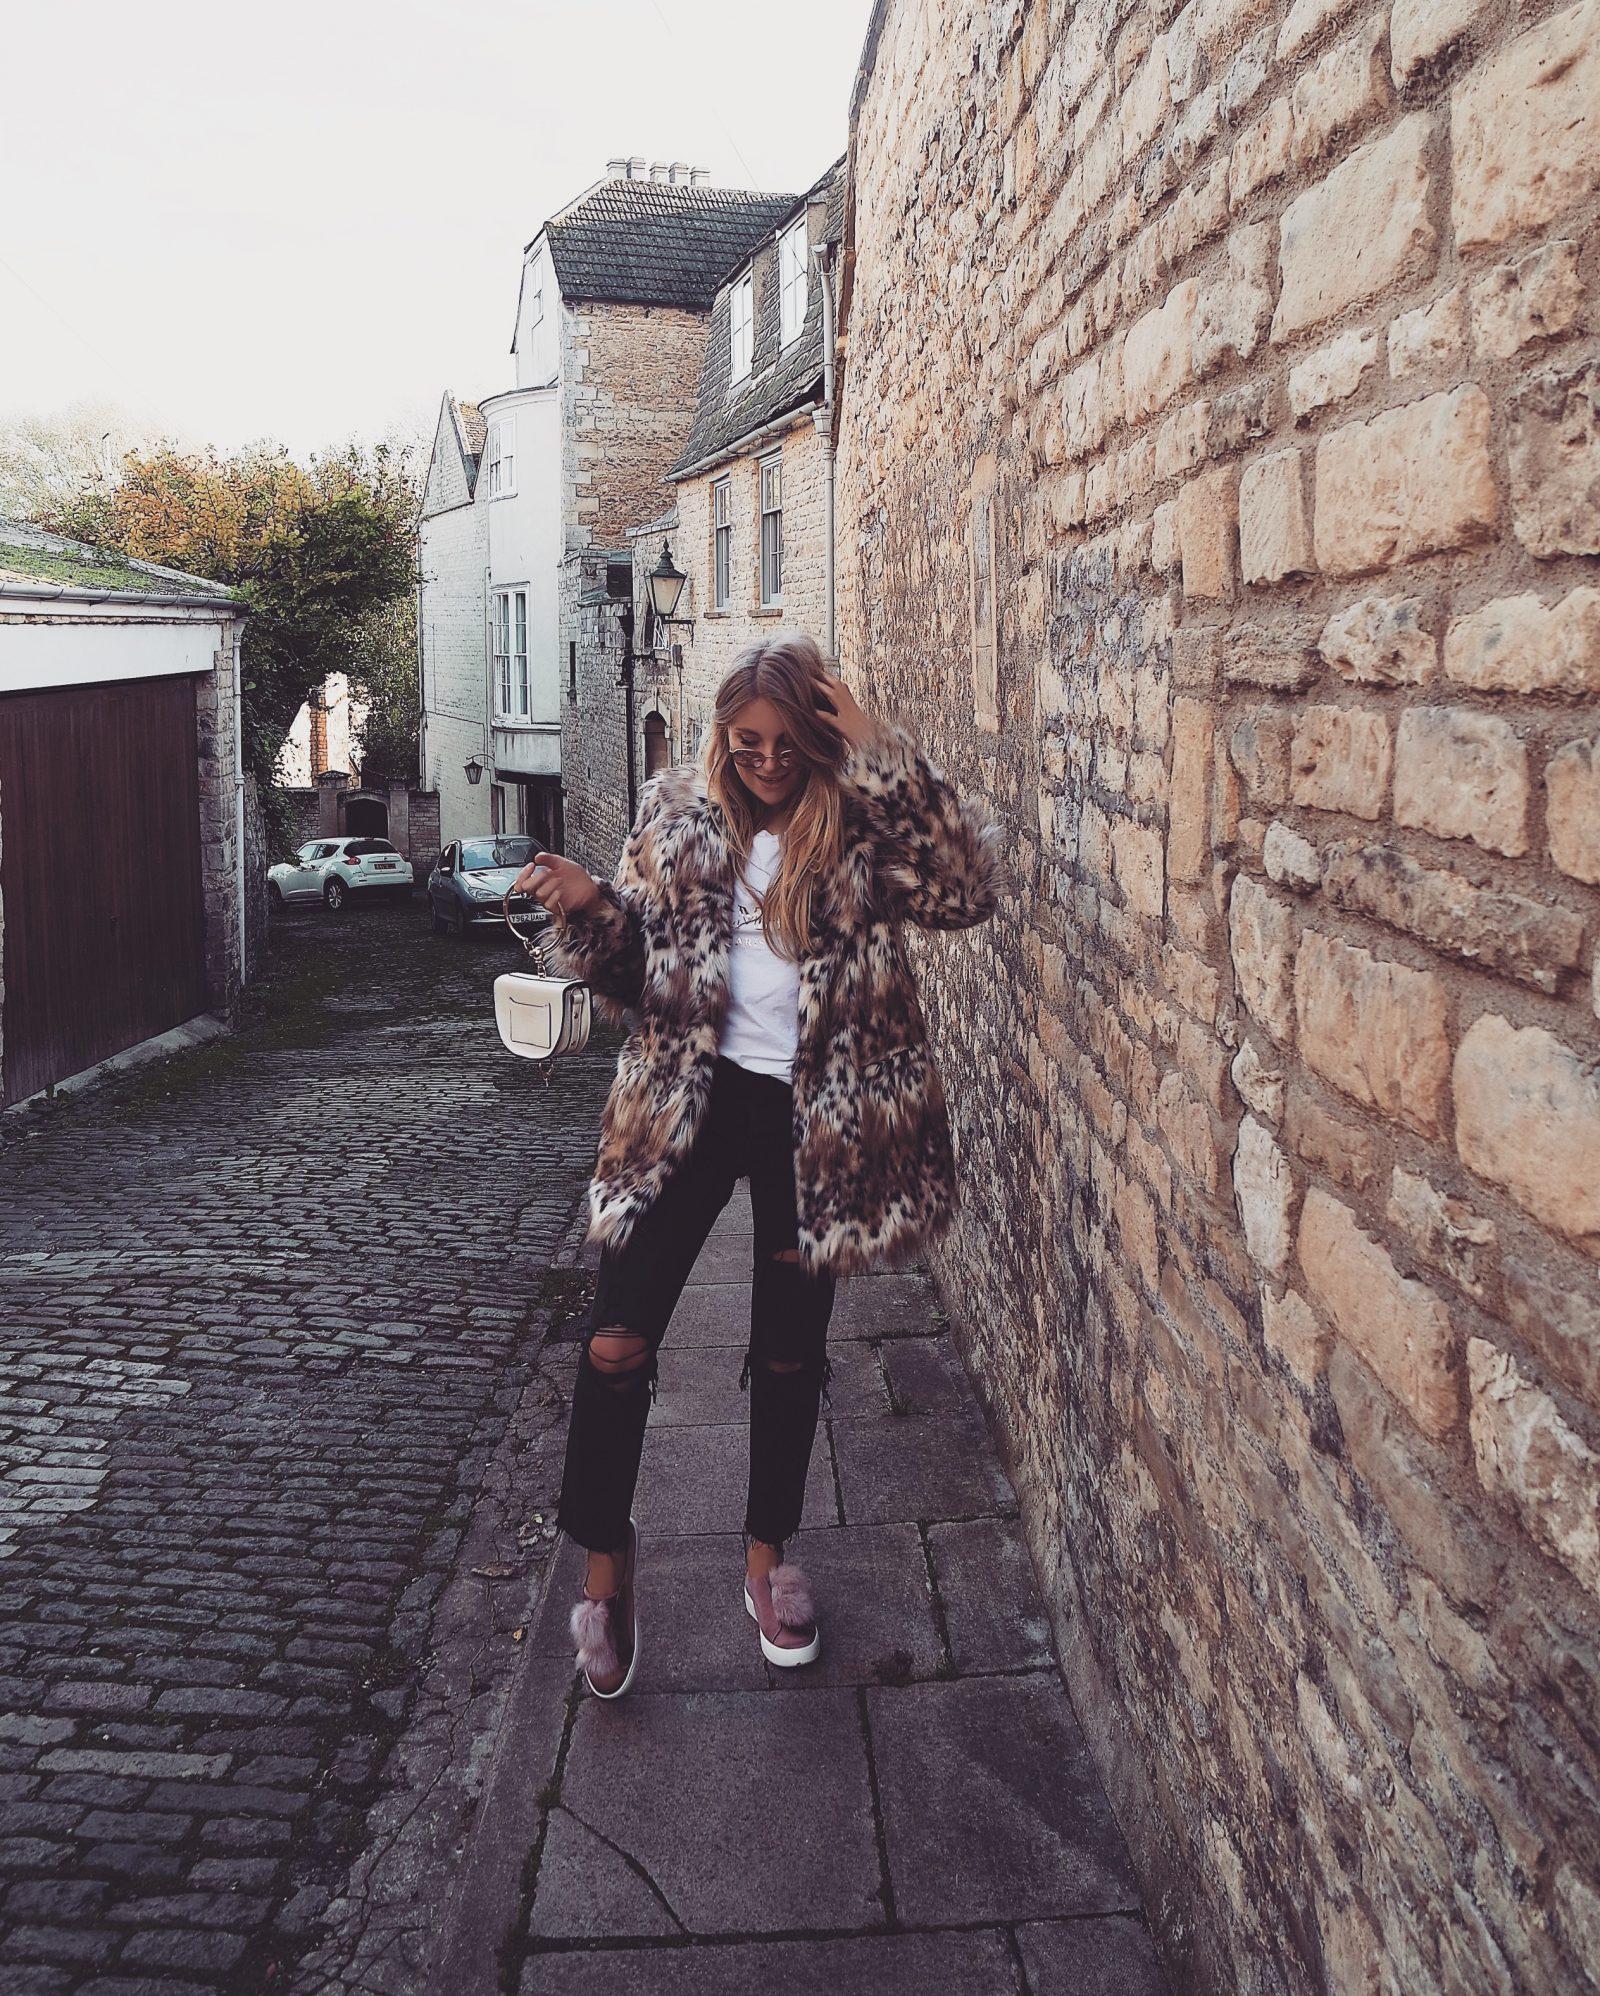 Leopard Print Coat - Street Style